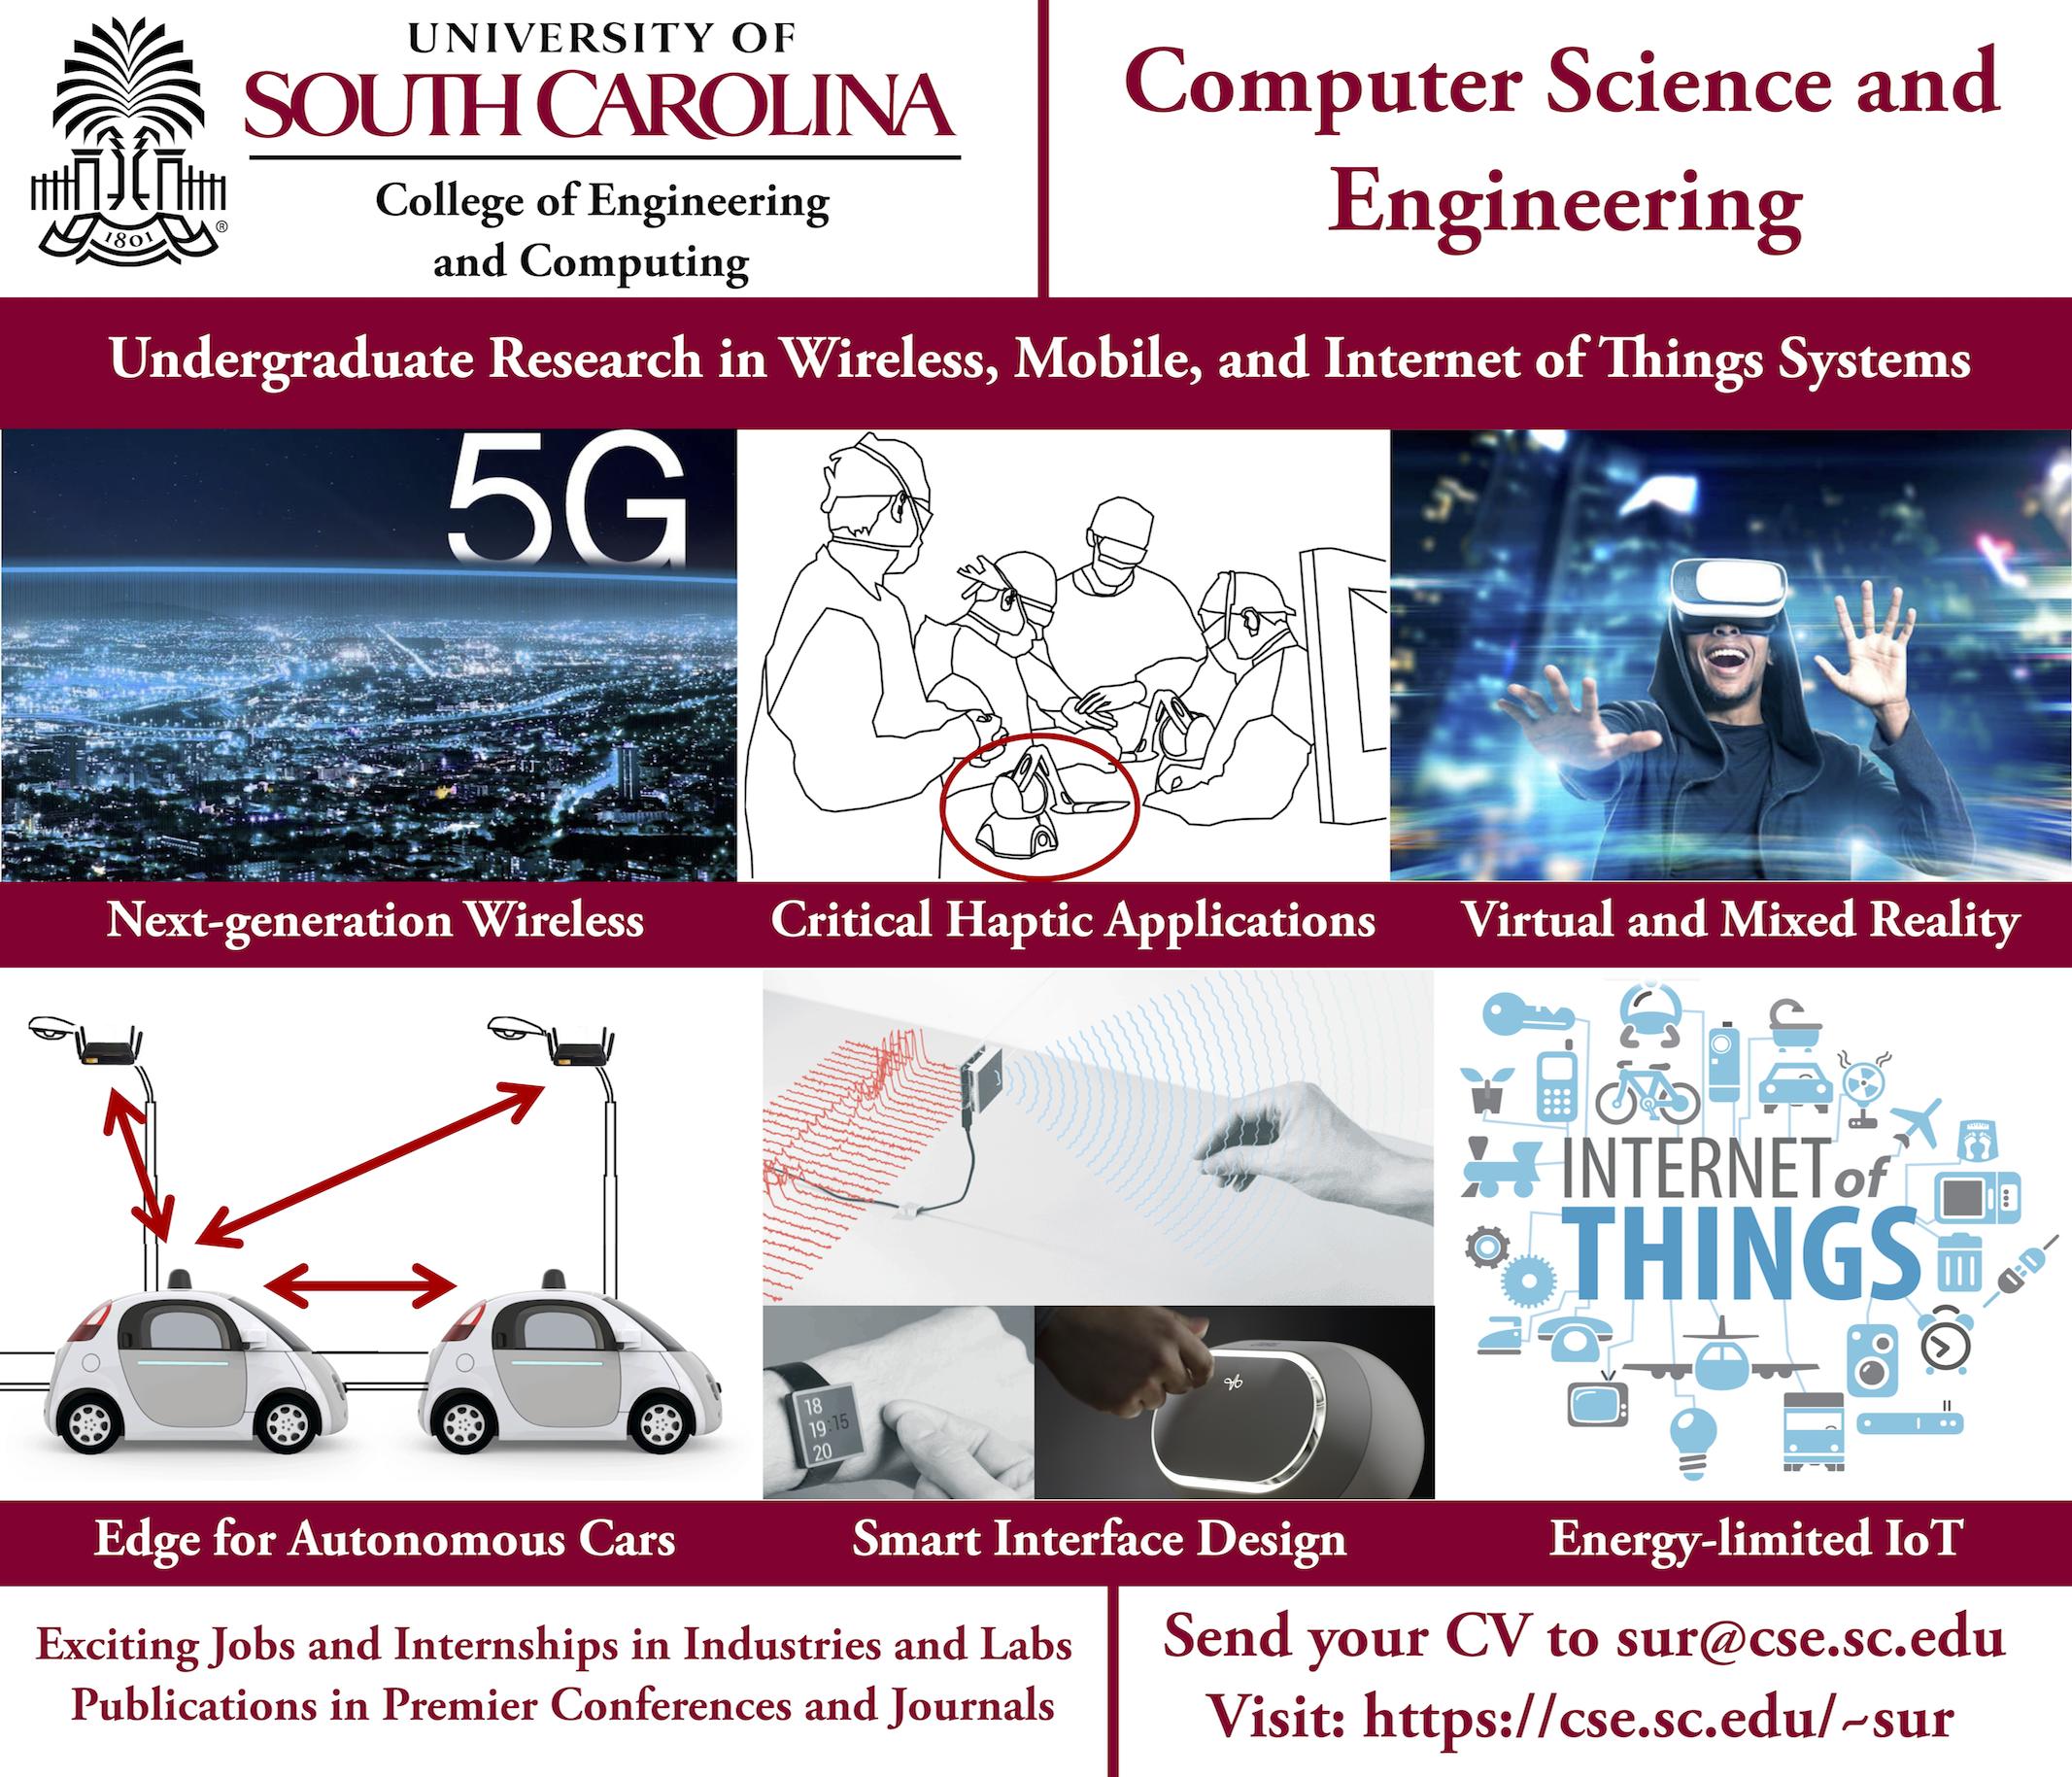 University Motors Columbia South Carolina >> University Motors Columbia South Carolina - impremedia.net